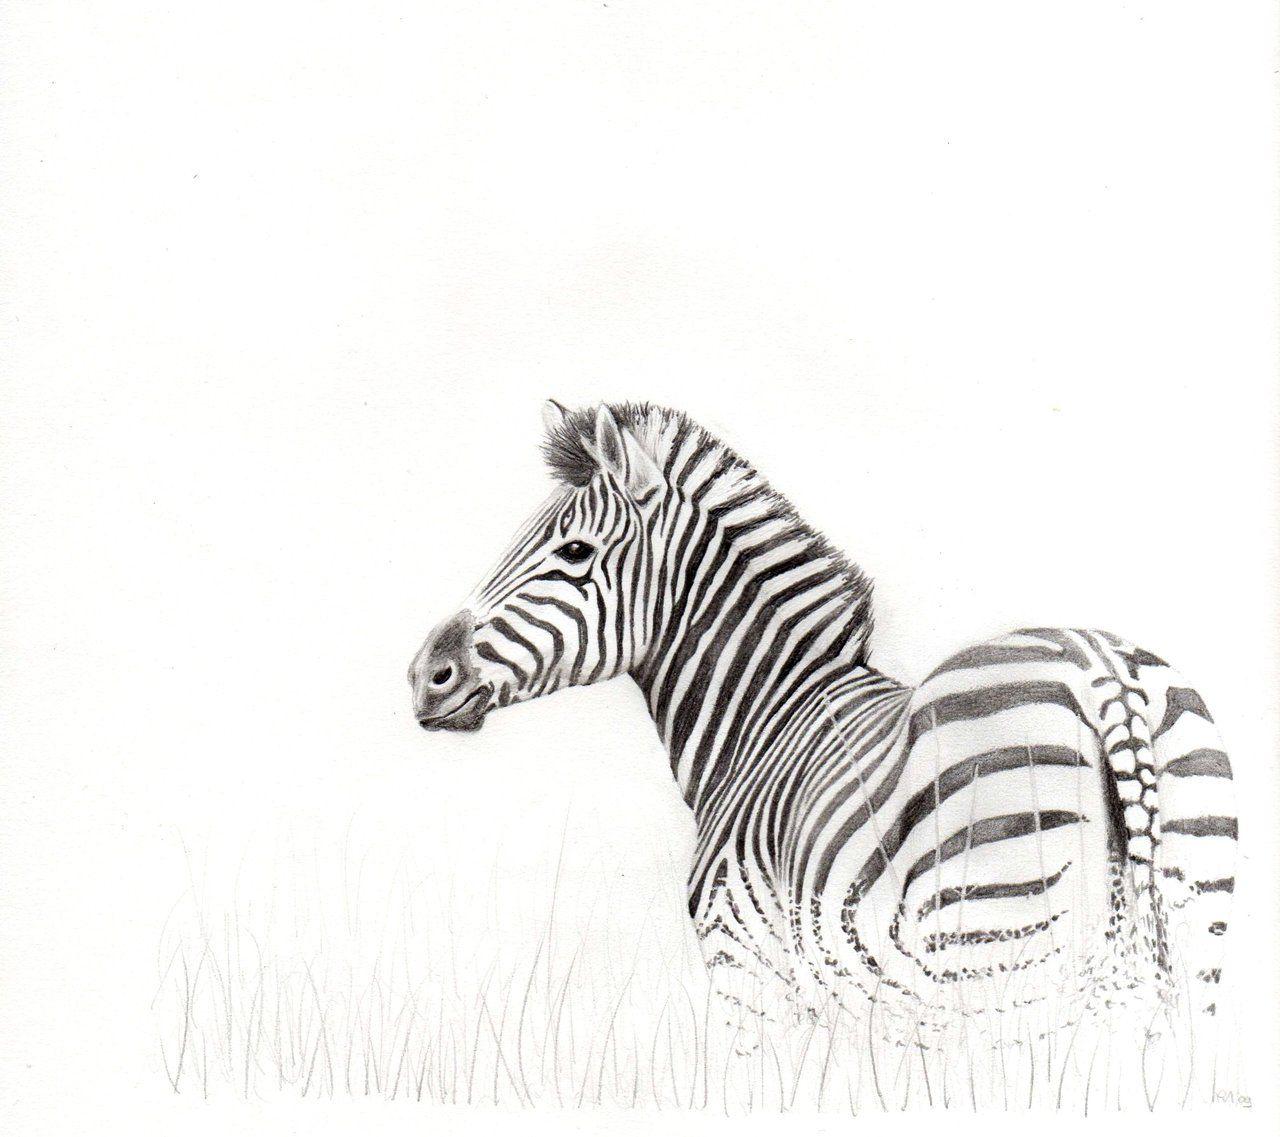 Zebra Drawing - Google Search